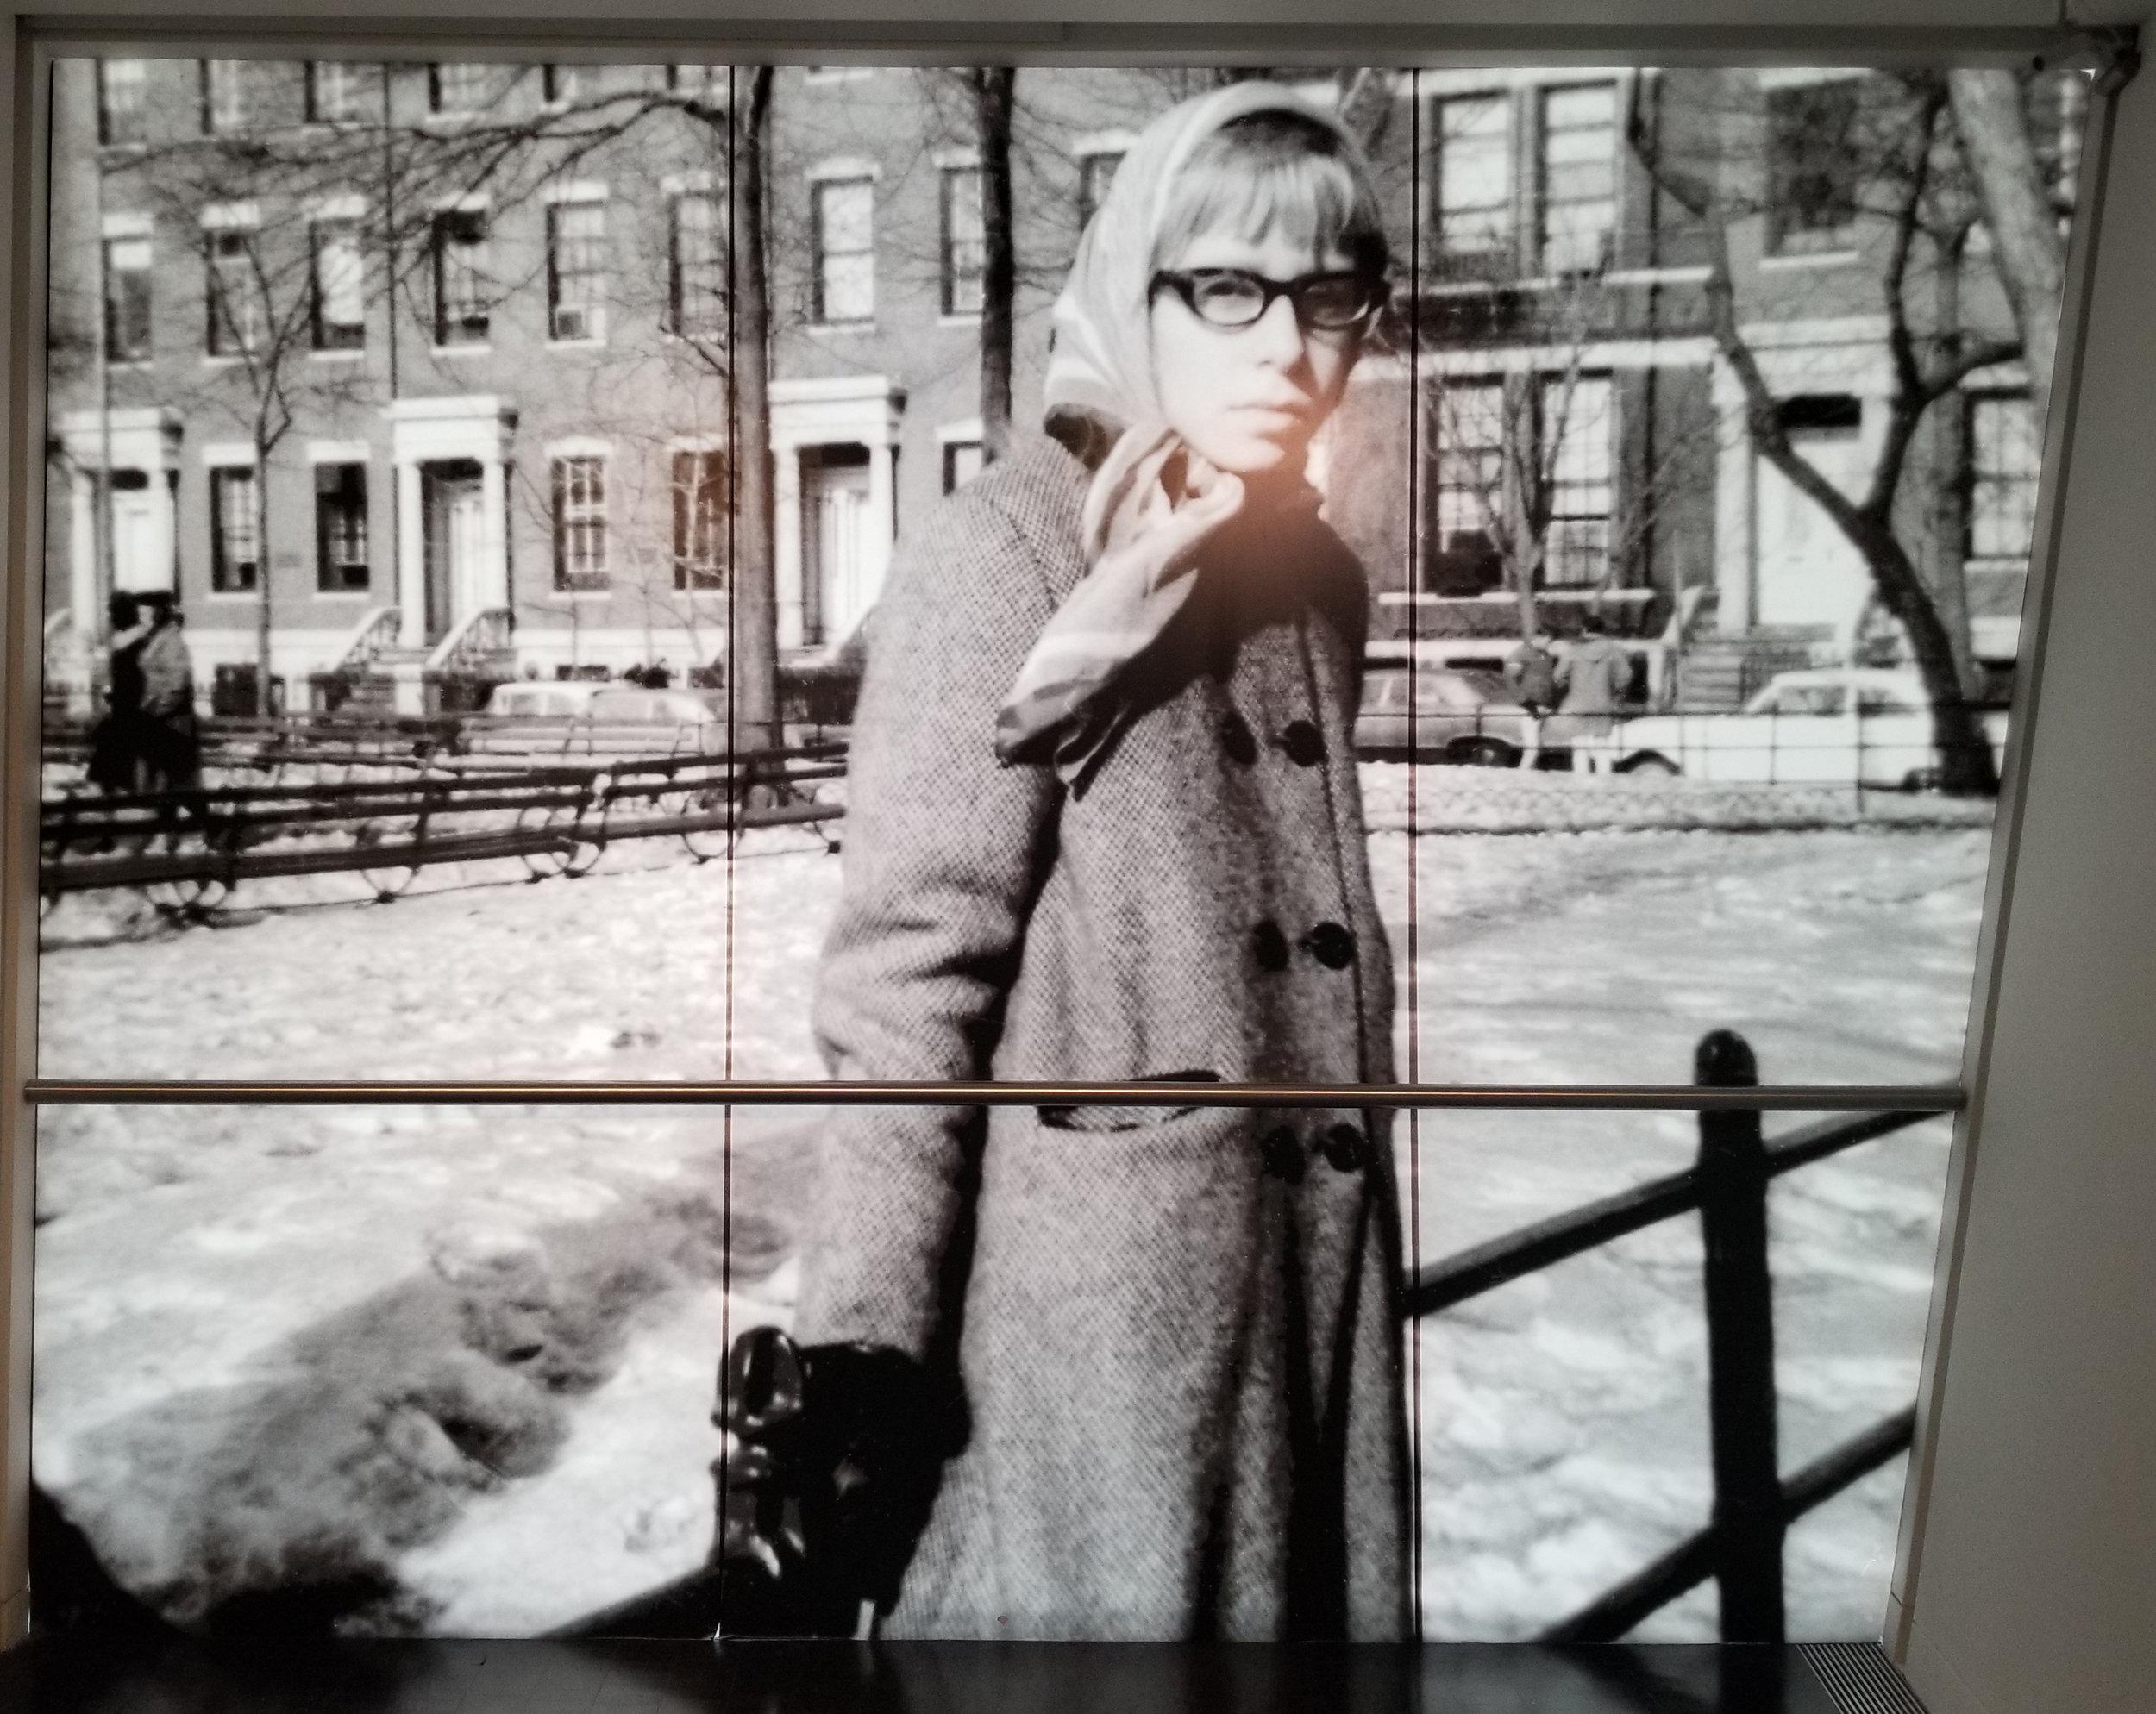 Roz Chast - Author, Illustrator, Artist